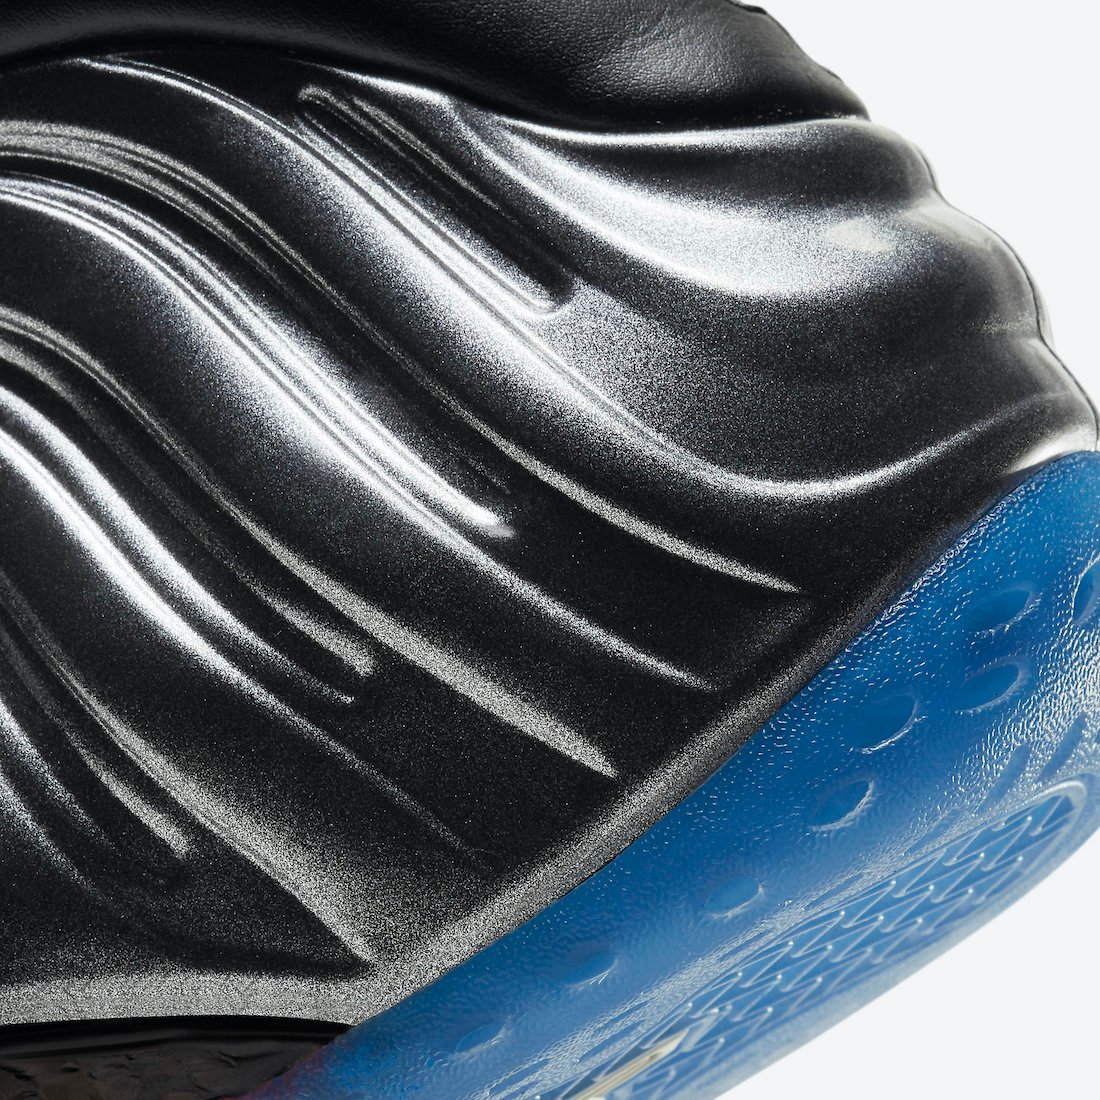 Nike Air Foamposite One Gradient Soles CU8063-001 Release Date